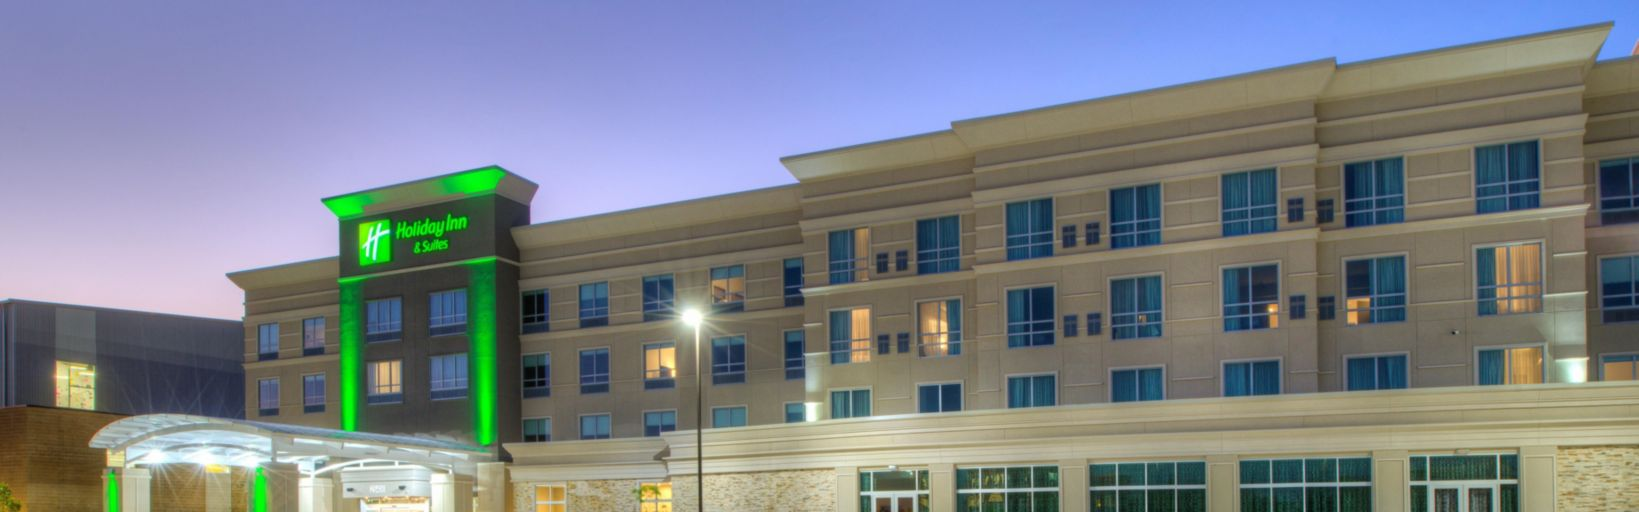 Holiday Inn Hotel Suites Houston West Katy